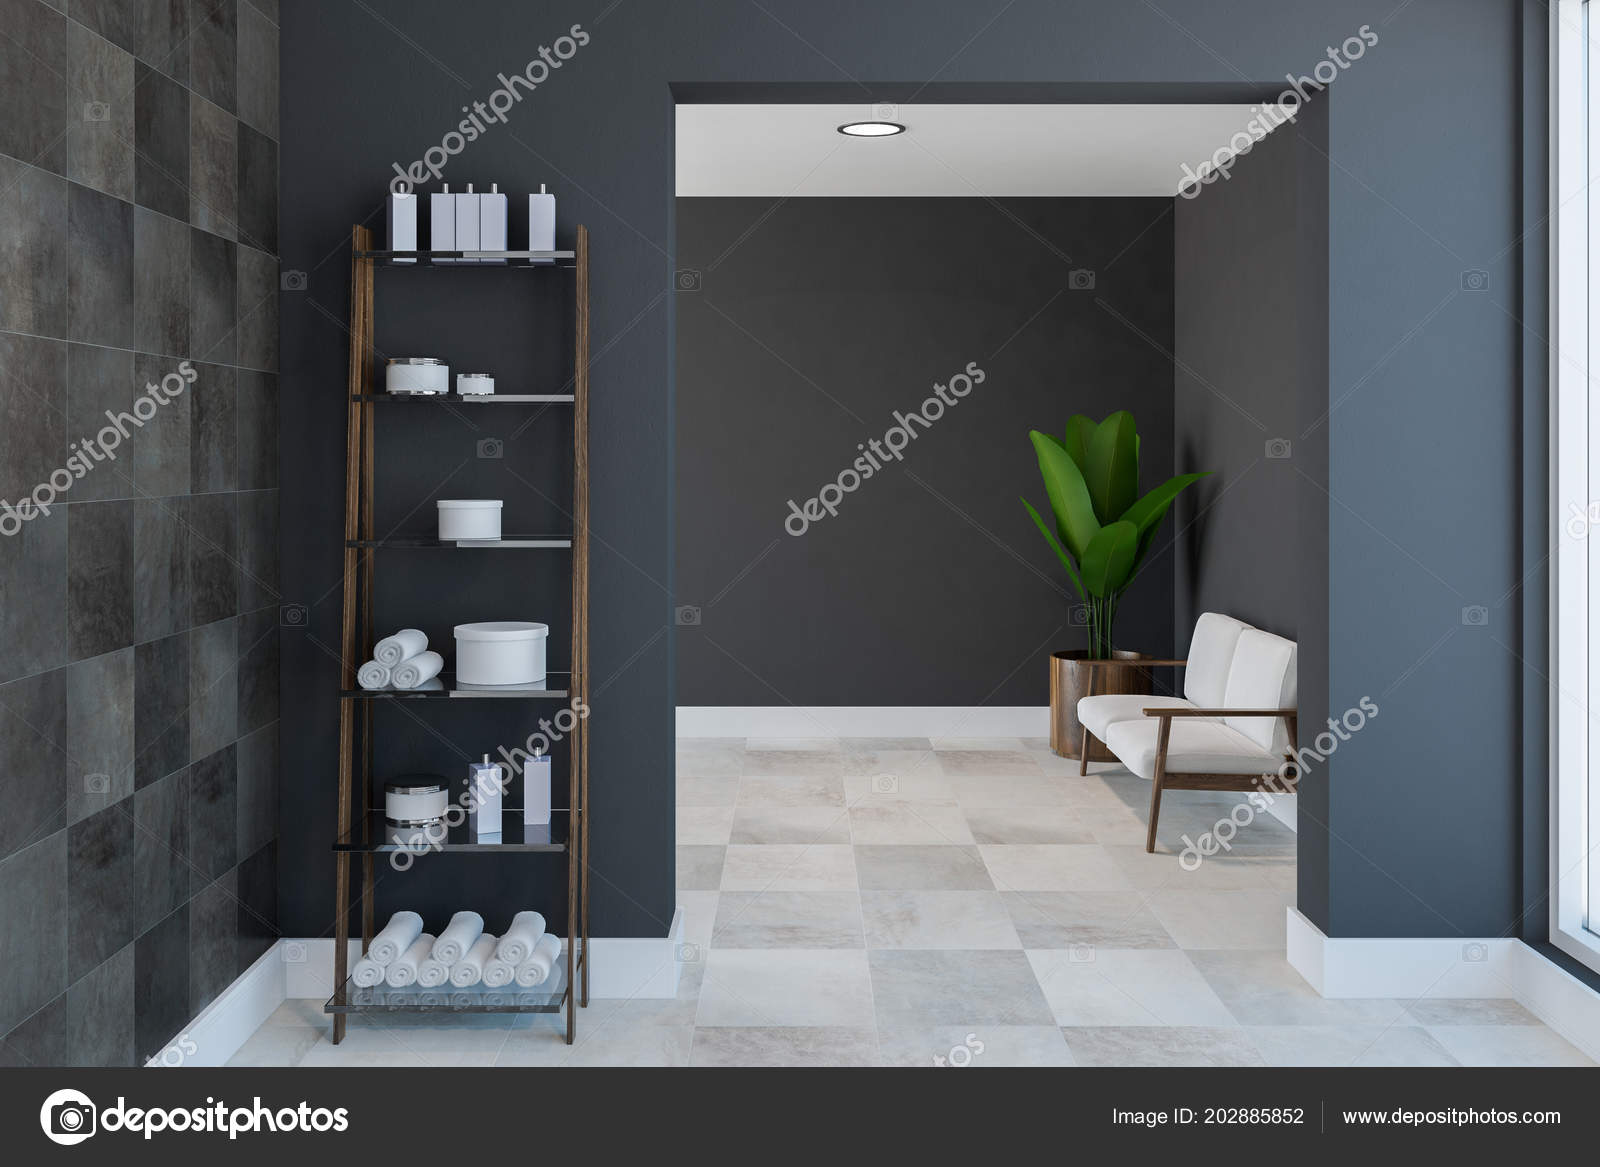 Shelves Towels Shampoo Spacious Bathroom Interior Black Tile Gray ...